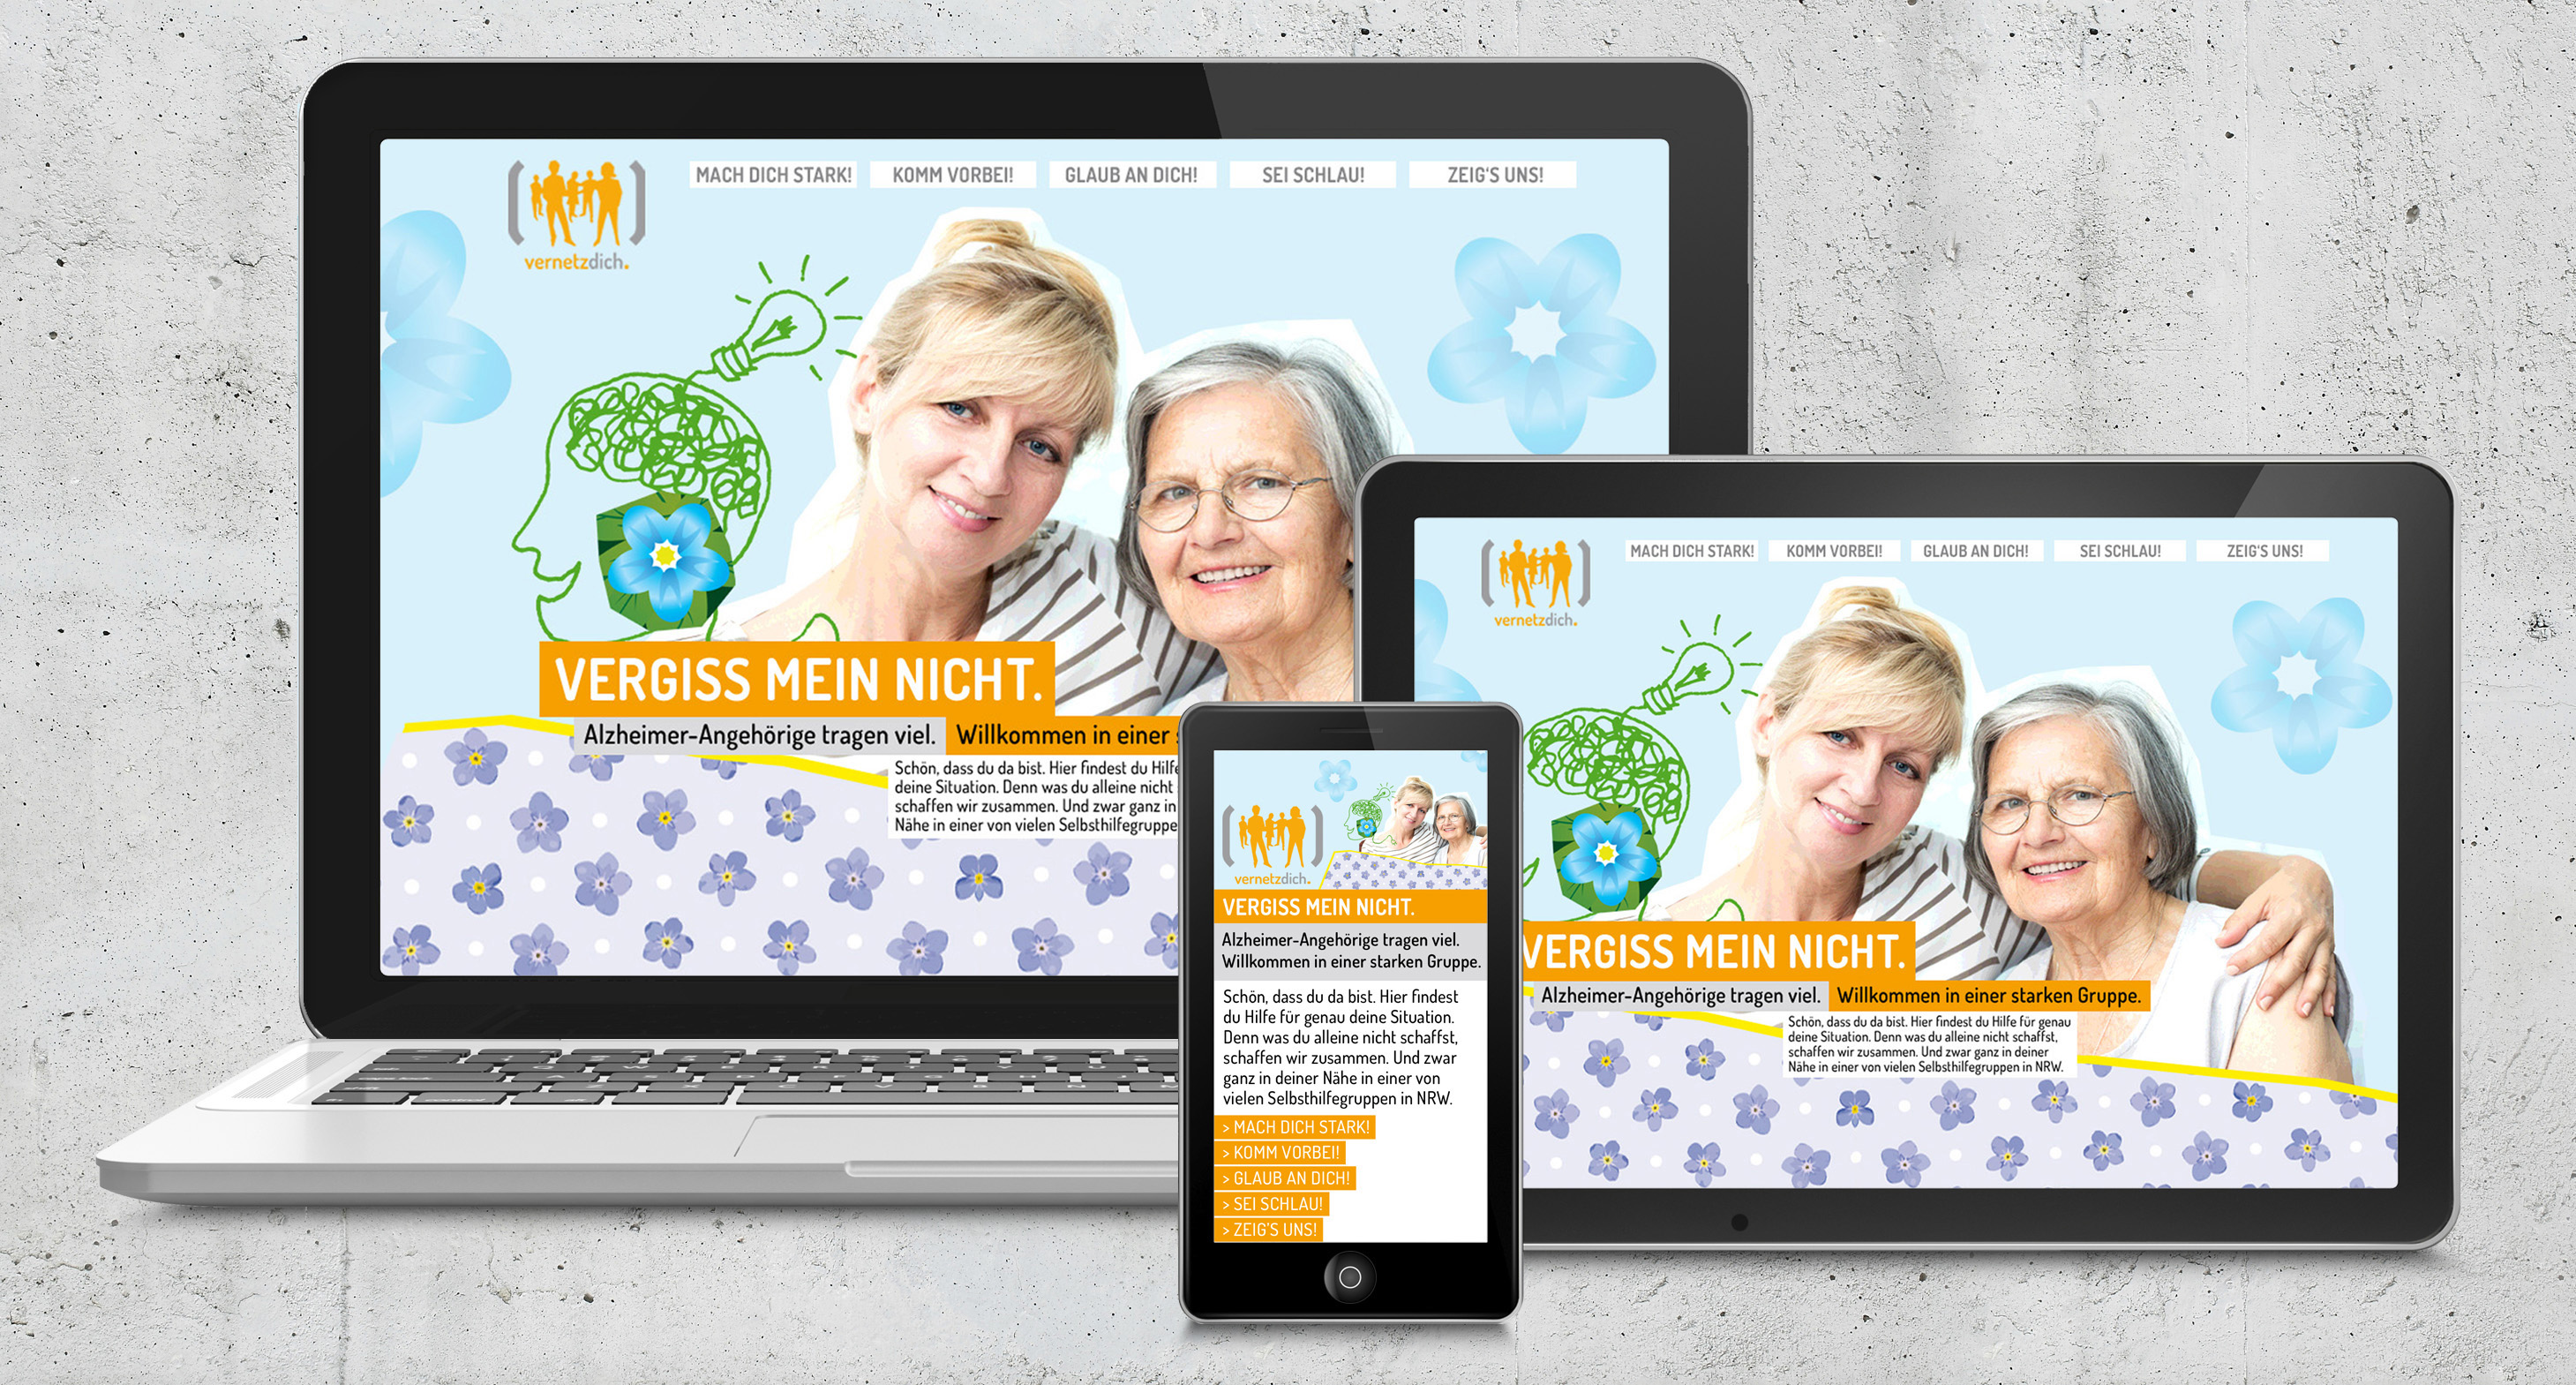 vdek-vernetzdich-Onlinekampagne-01